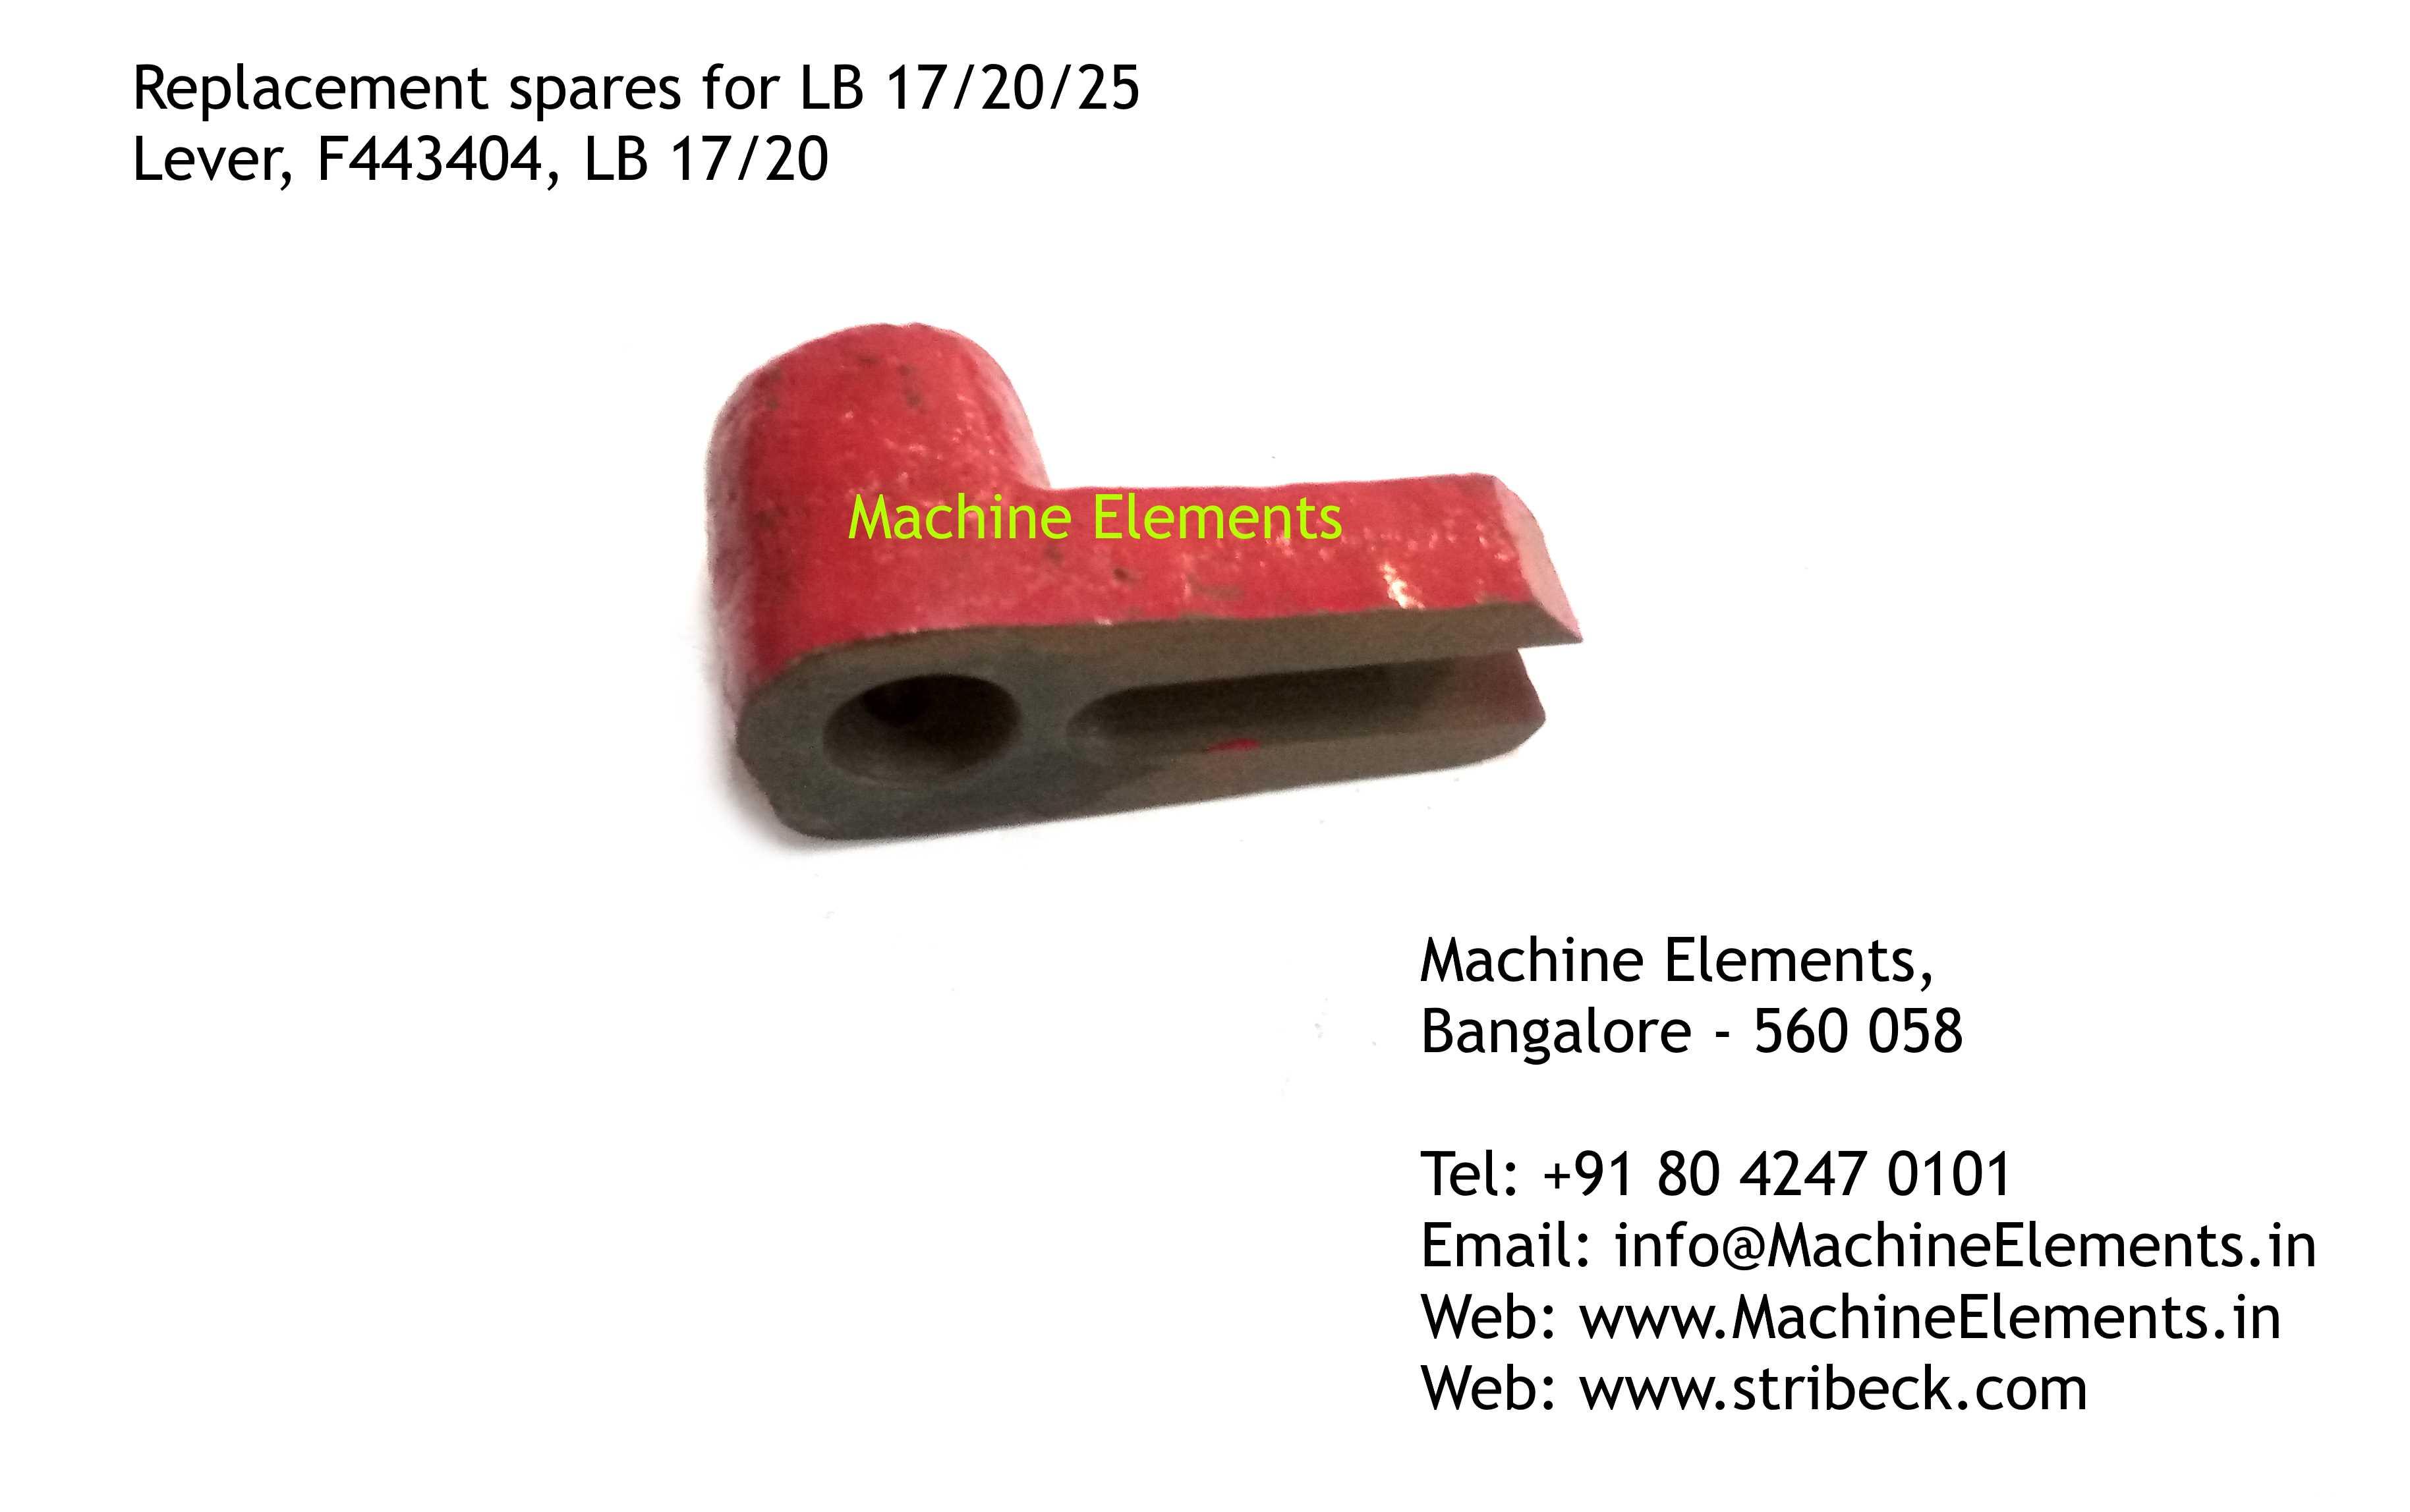 Lever, F443404